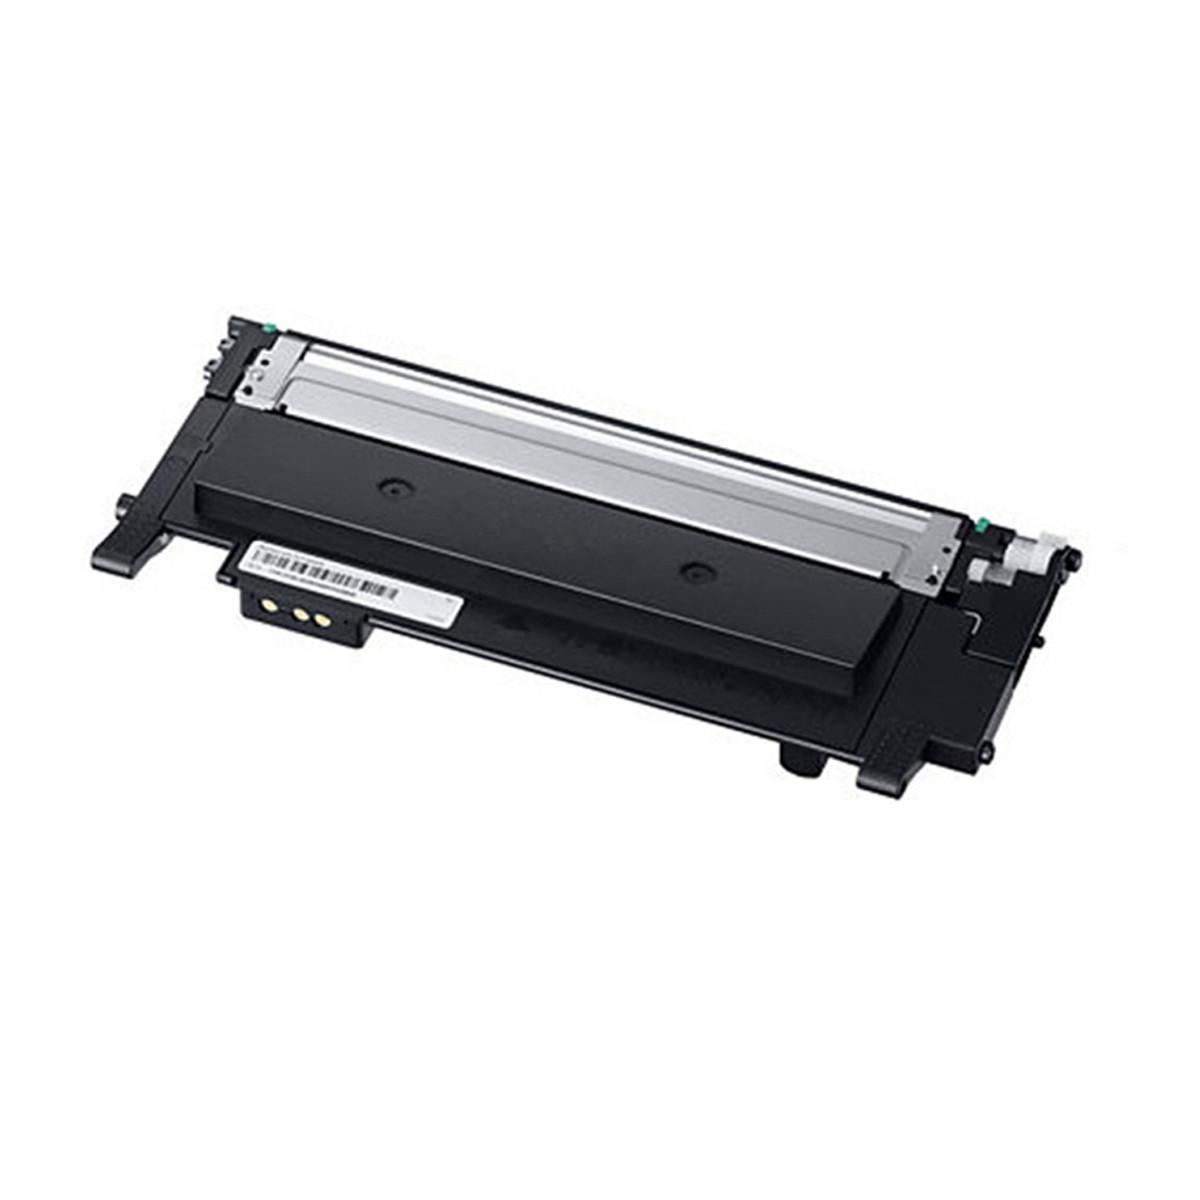 Toner Compatível com Samsung CLT-K404S CLT-404S Preto | C430 C480 C430W C480W C480FW | Premium 1.5k